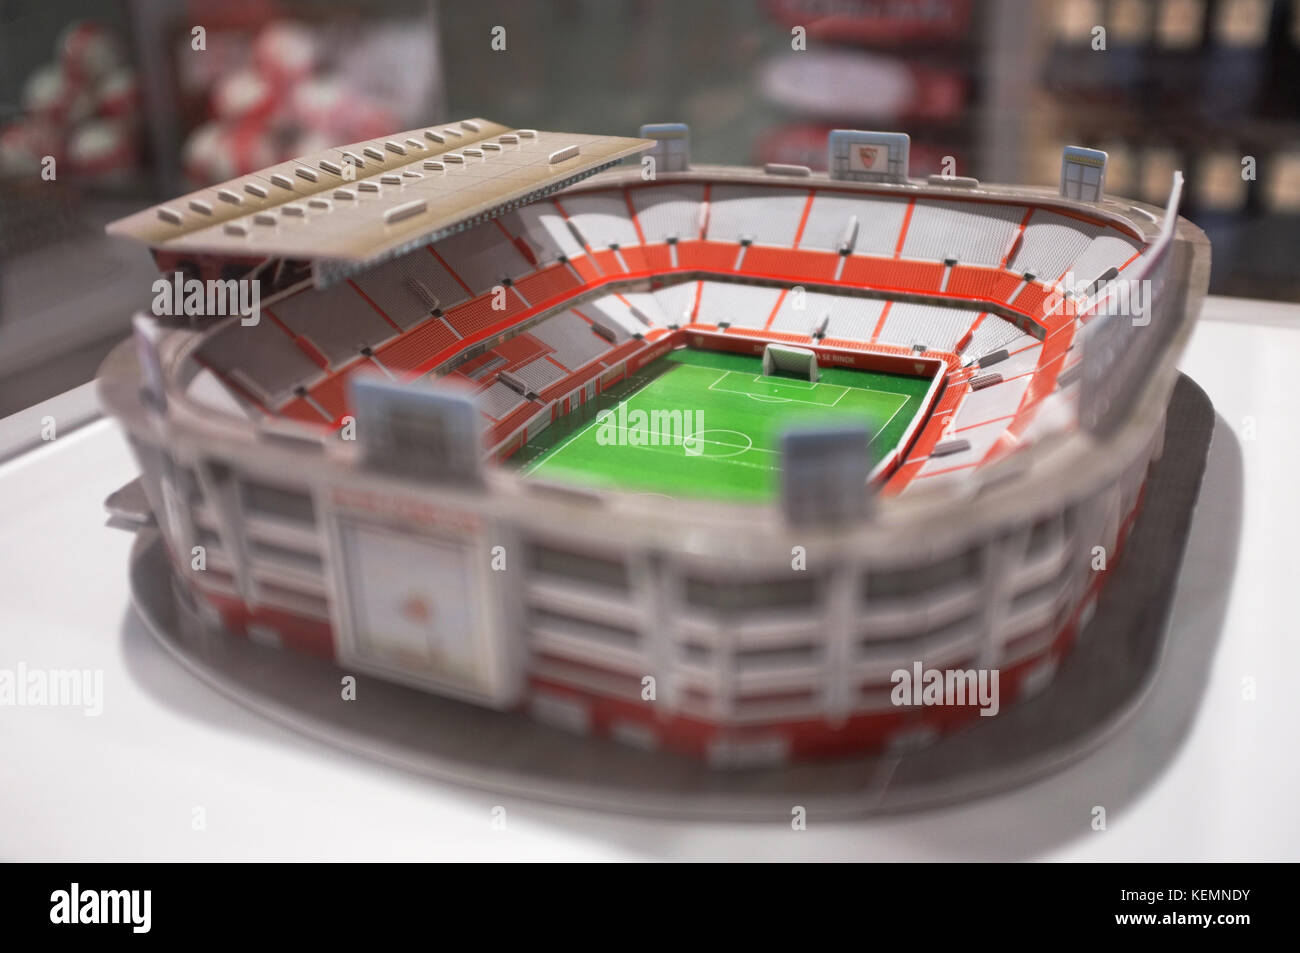 A model of the Ramón Sánchez Pizjuán Stadium, Sevilla FC vs Las Palmas, Seville, Andalucia, Spain, - Stock Image